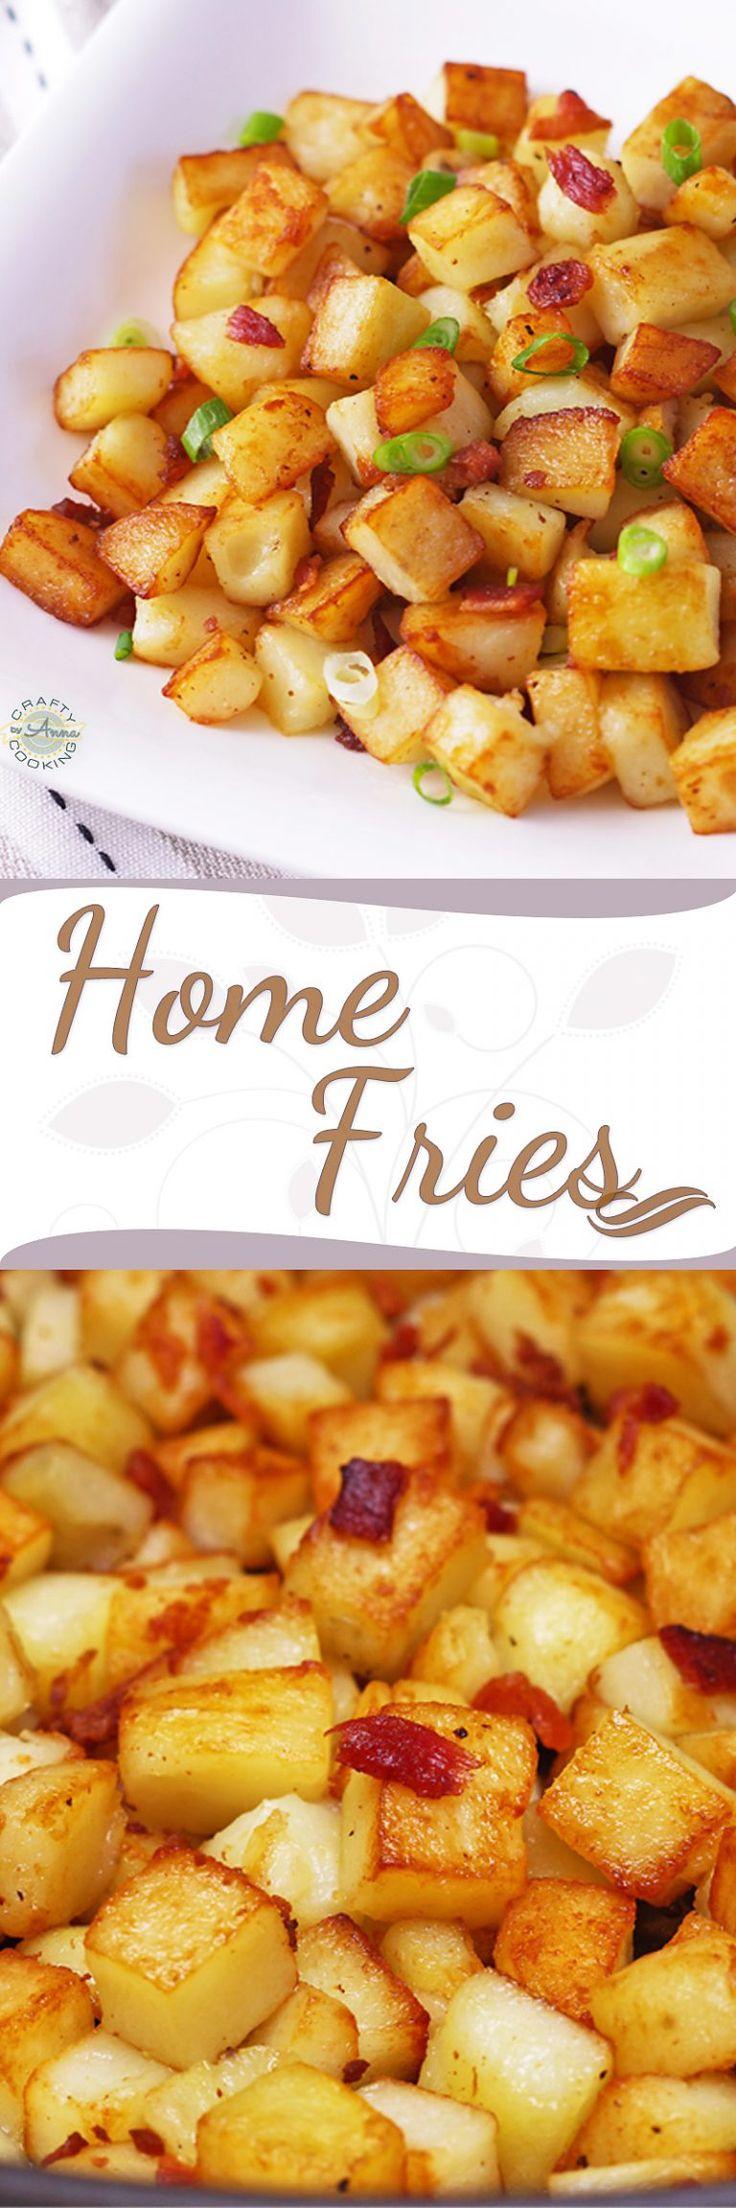 Easy Home Fries (Домашняя Жареная Картошка). VIDEO RECIPE!